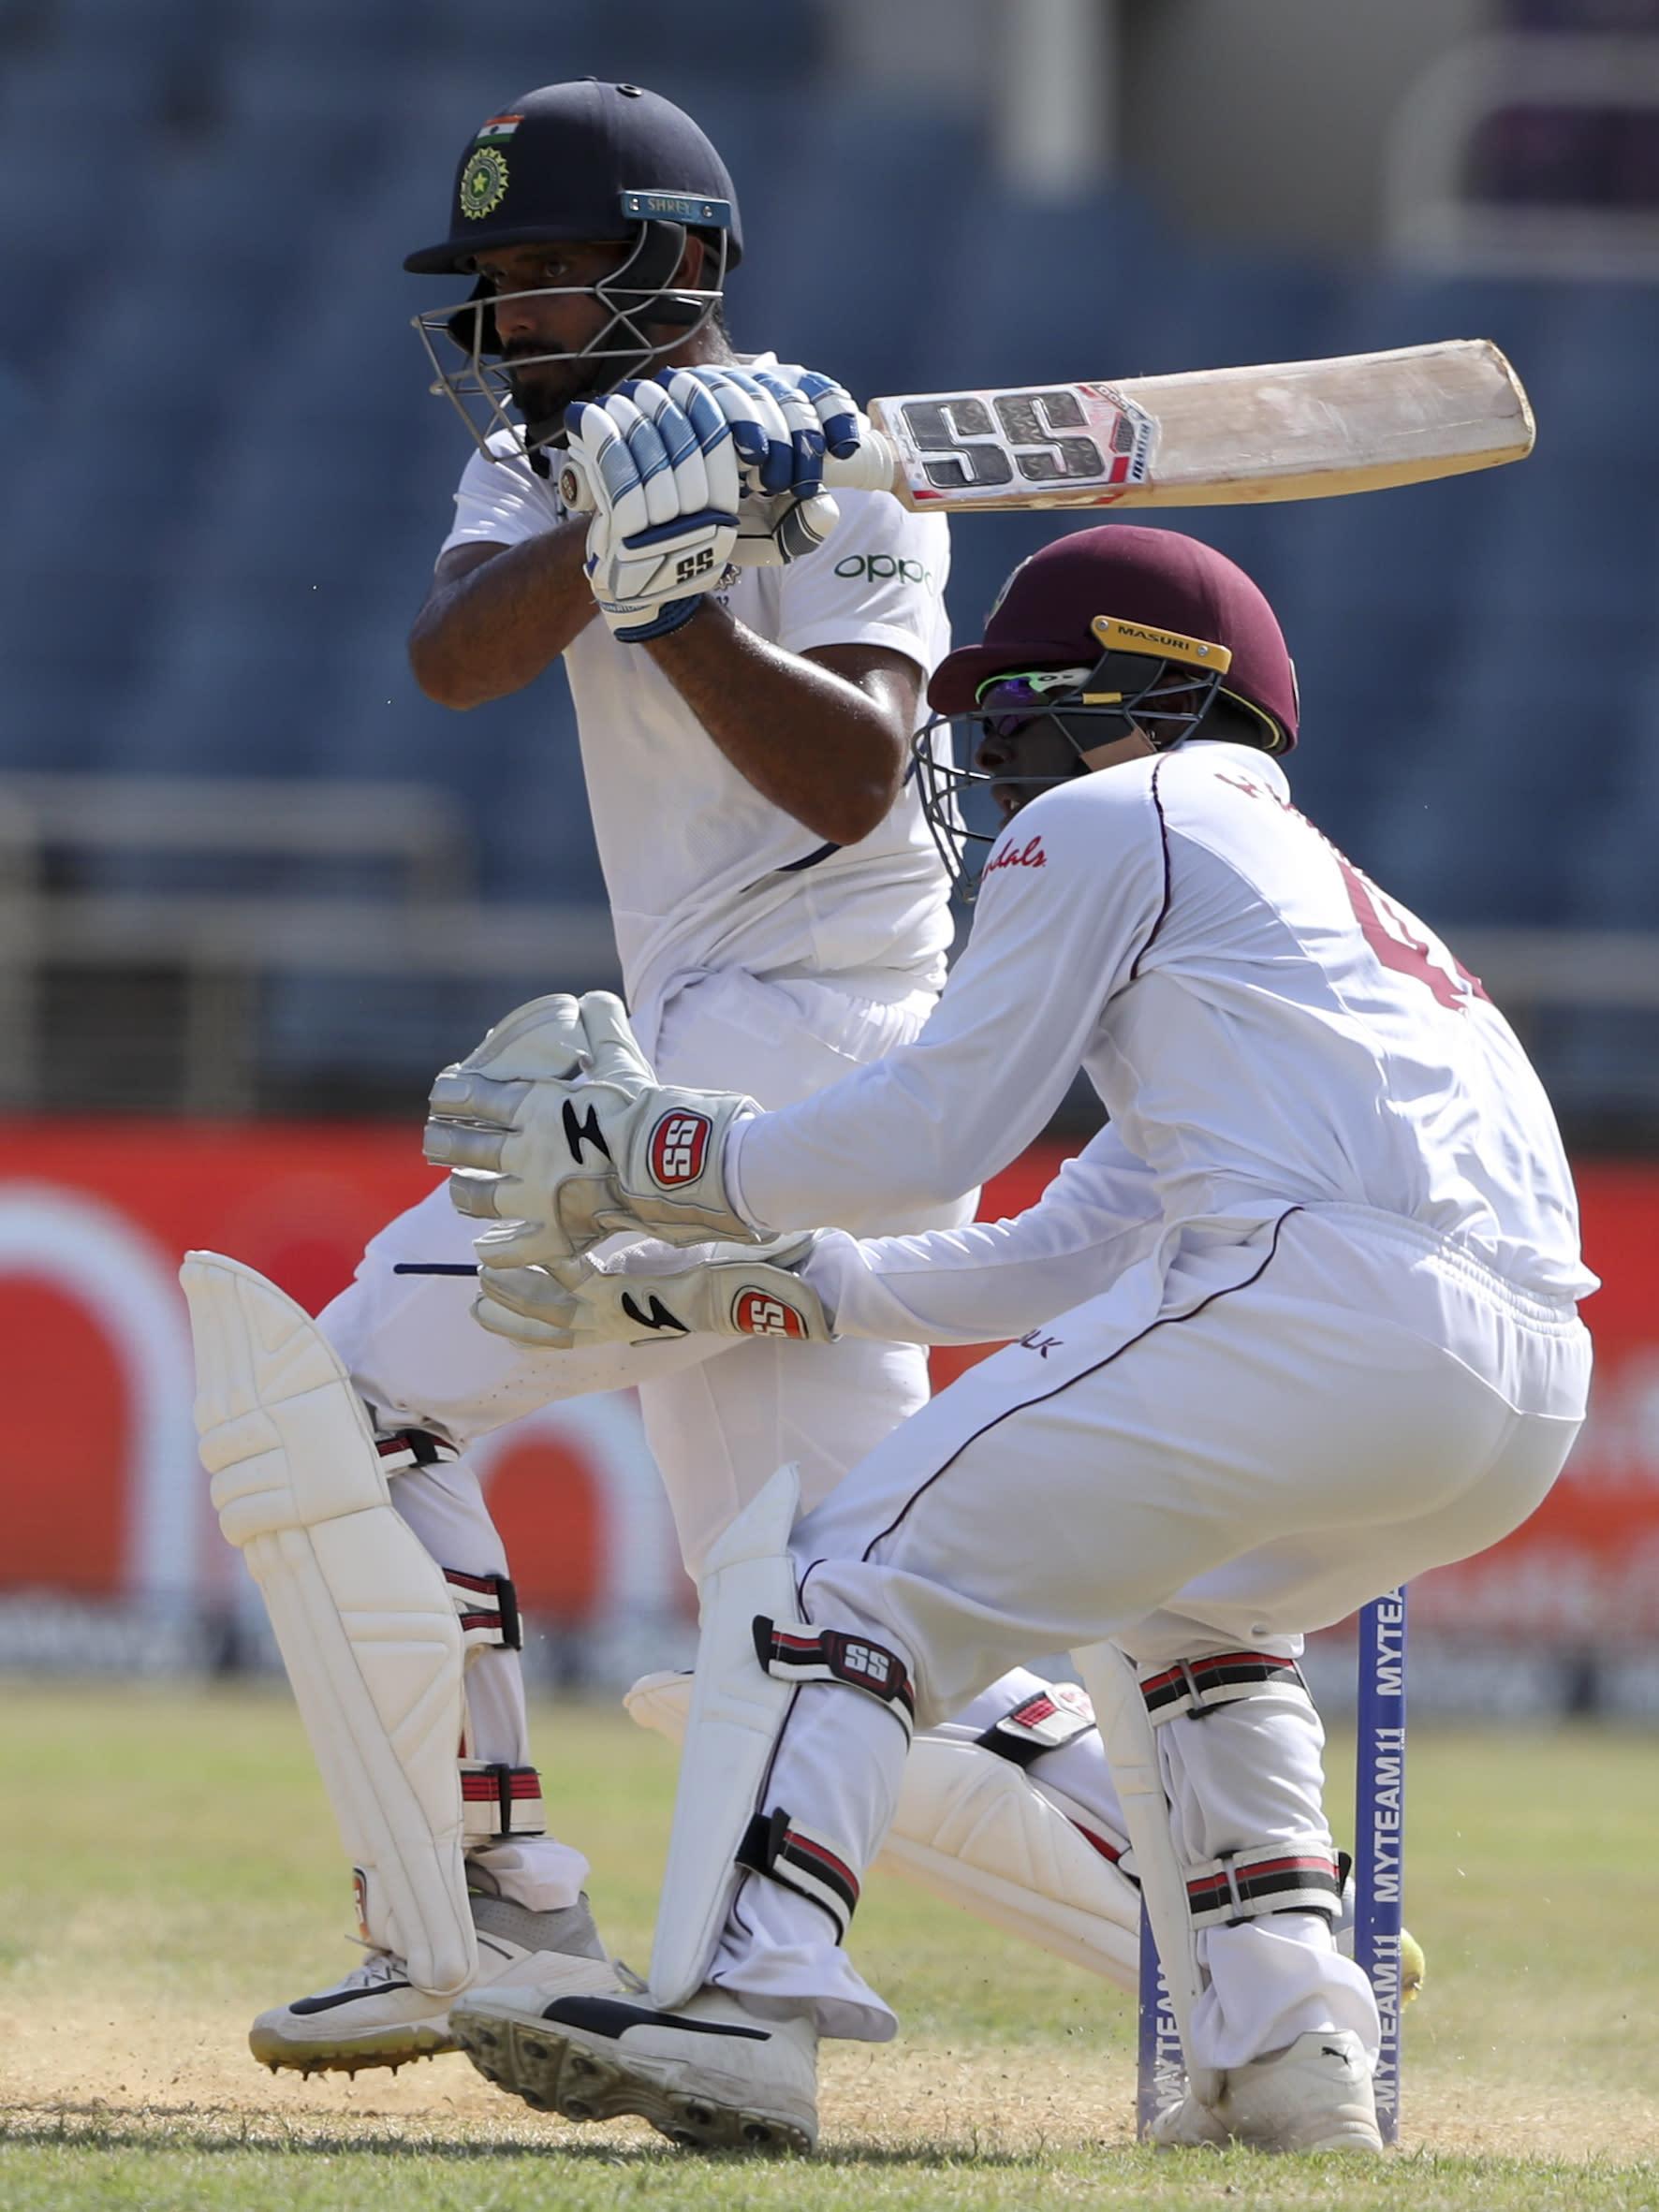 India's Hanuma Vihari plays a shot against West Indies during day three of the second Test cricket match at Sabina Park cricket ground in Kingston, Jamaica Sunday, Sept. 1, 2019. (AP Photo/Ricardo Mazalan)